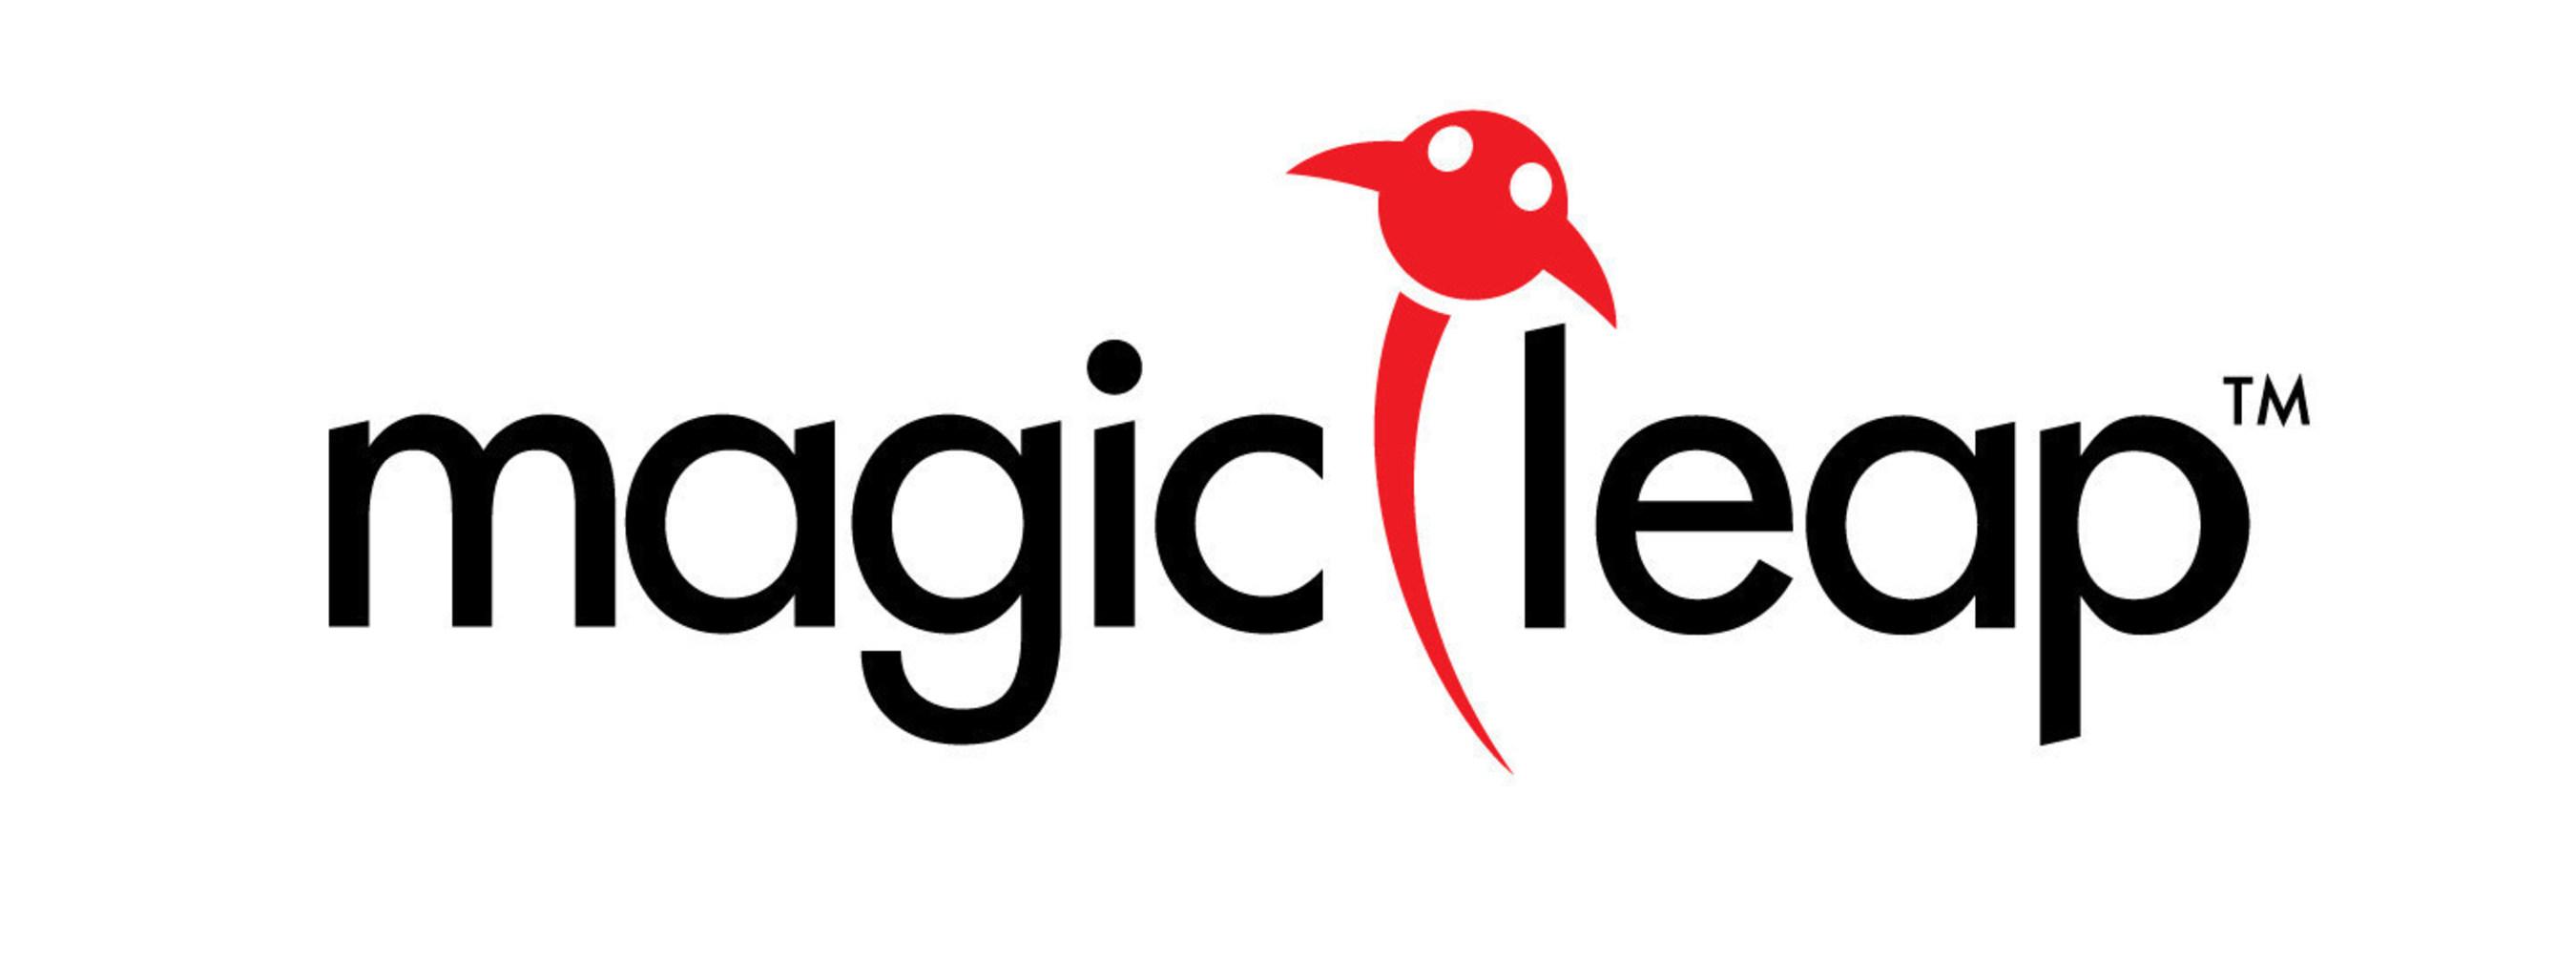 graphic regarding Weta Uk Printable Schedule known as Magic Soar Announces Expanded Purpose for Weta Workshops Sir